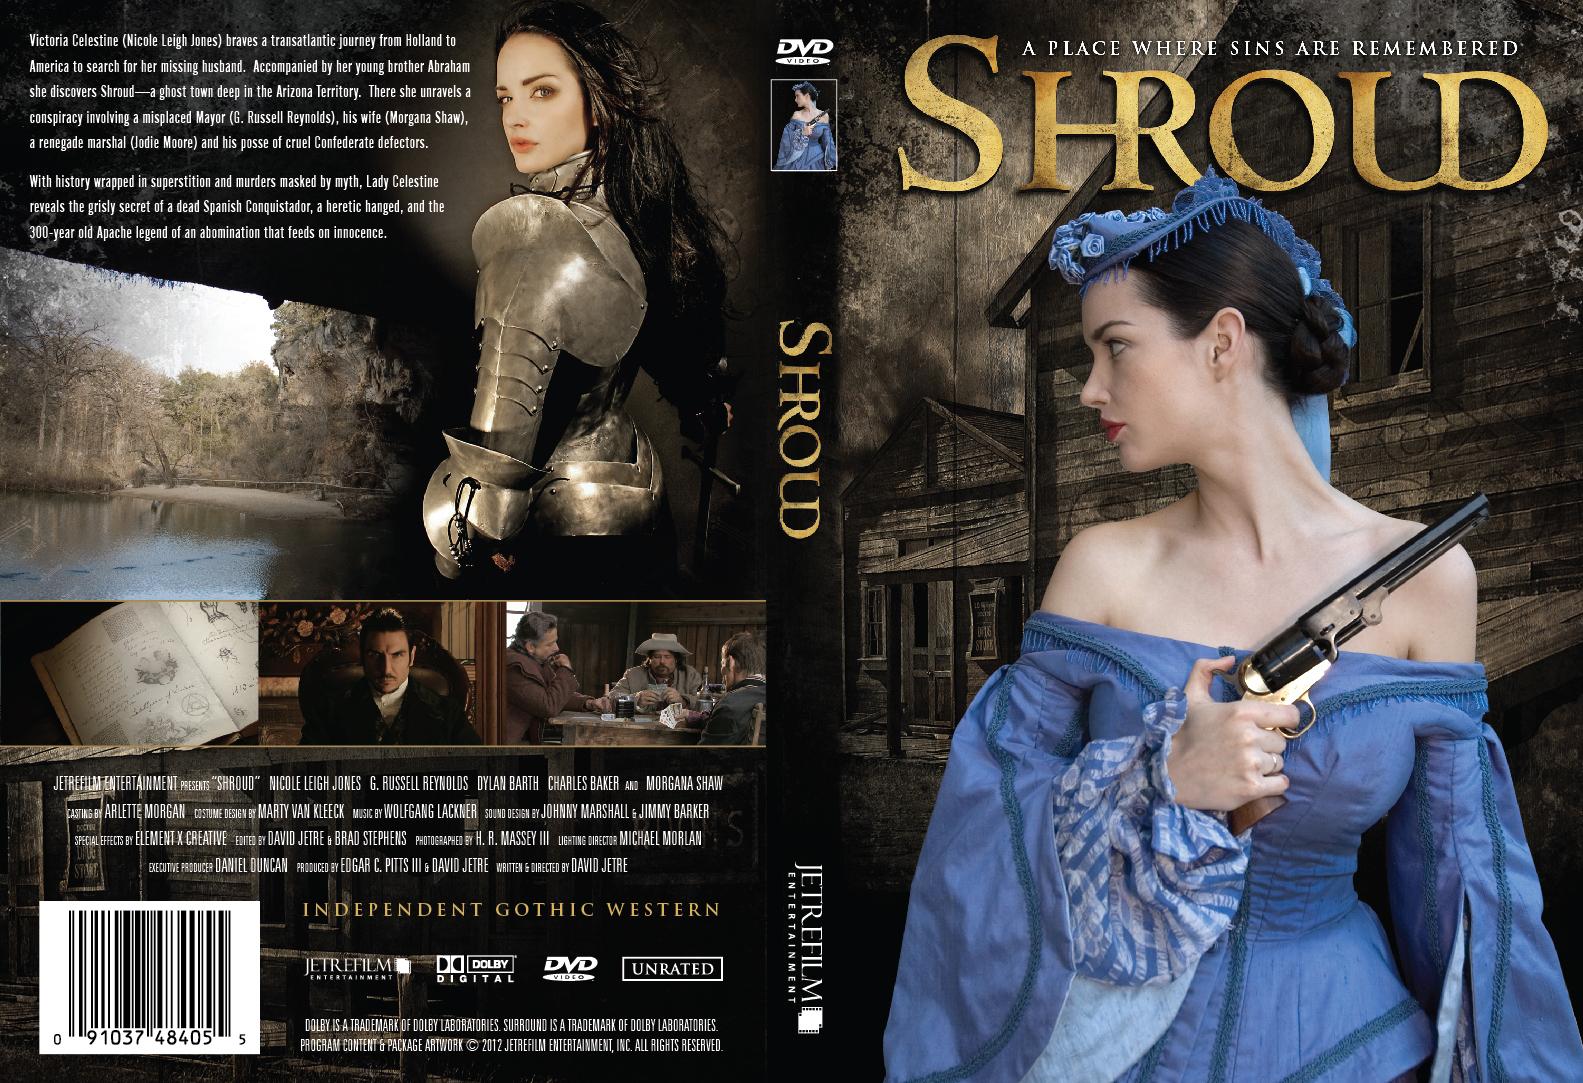 Shroud DVD